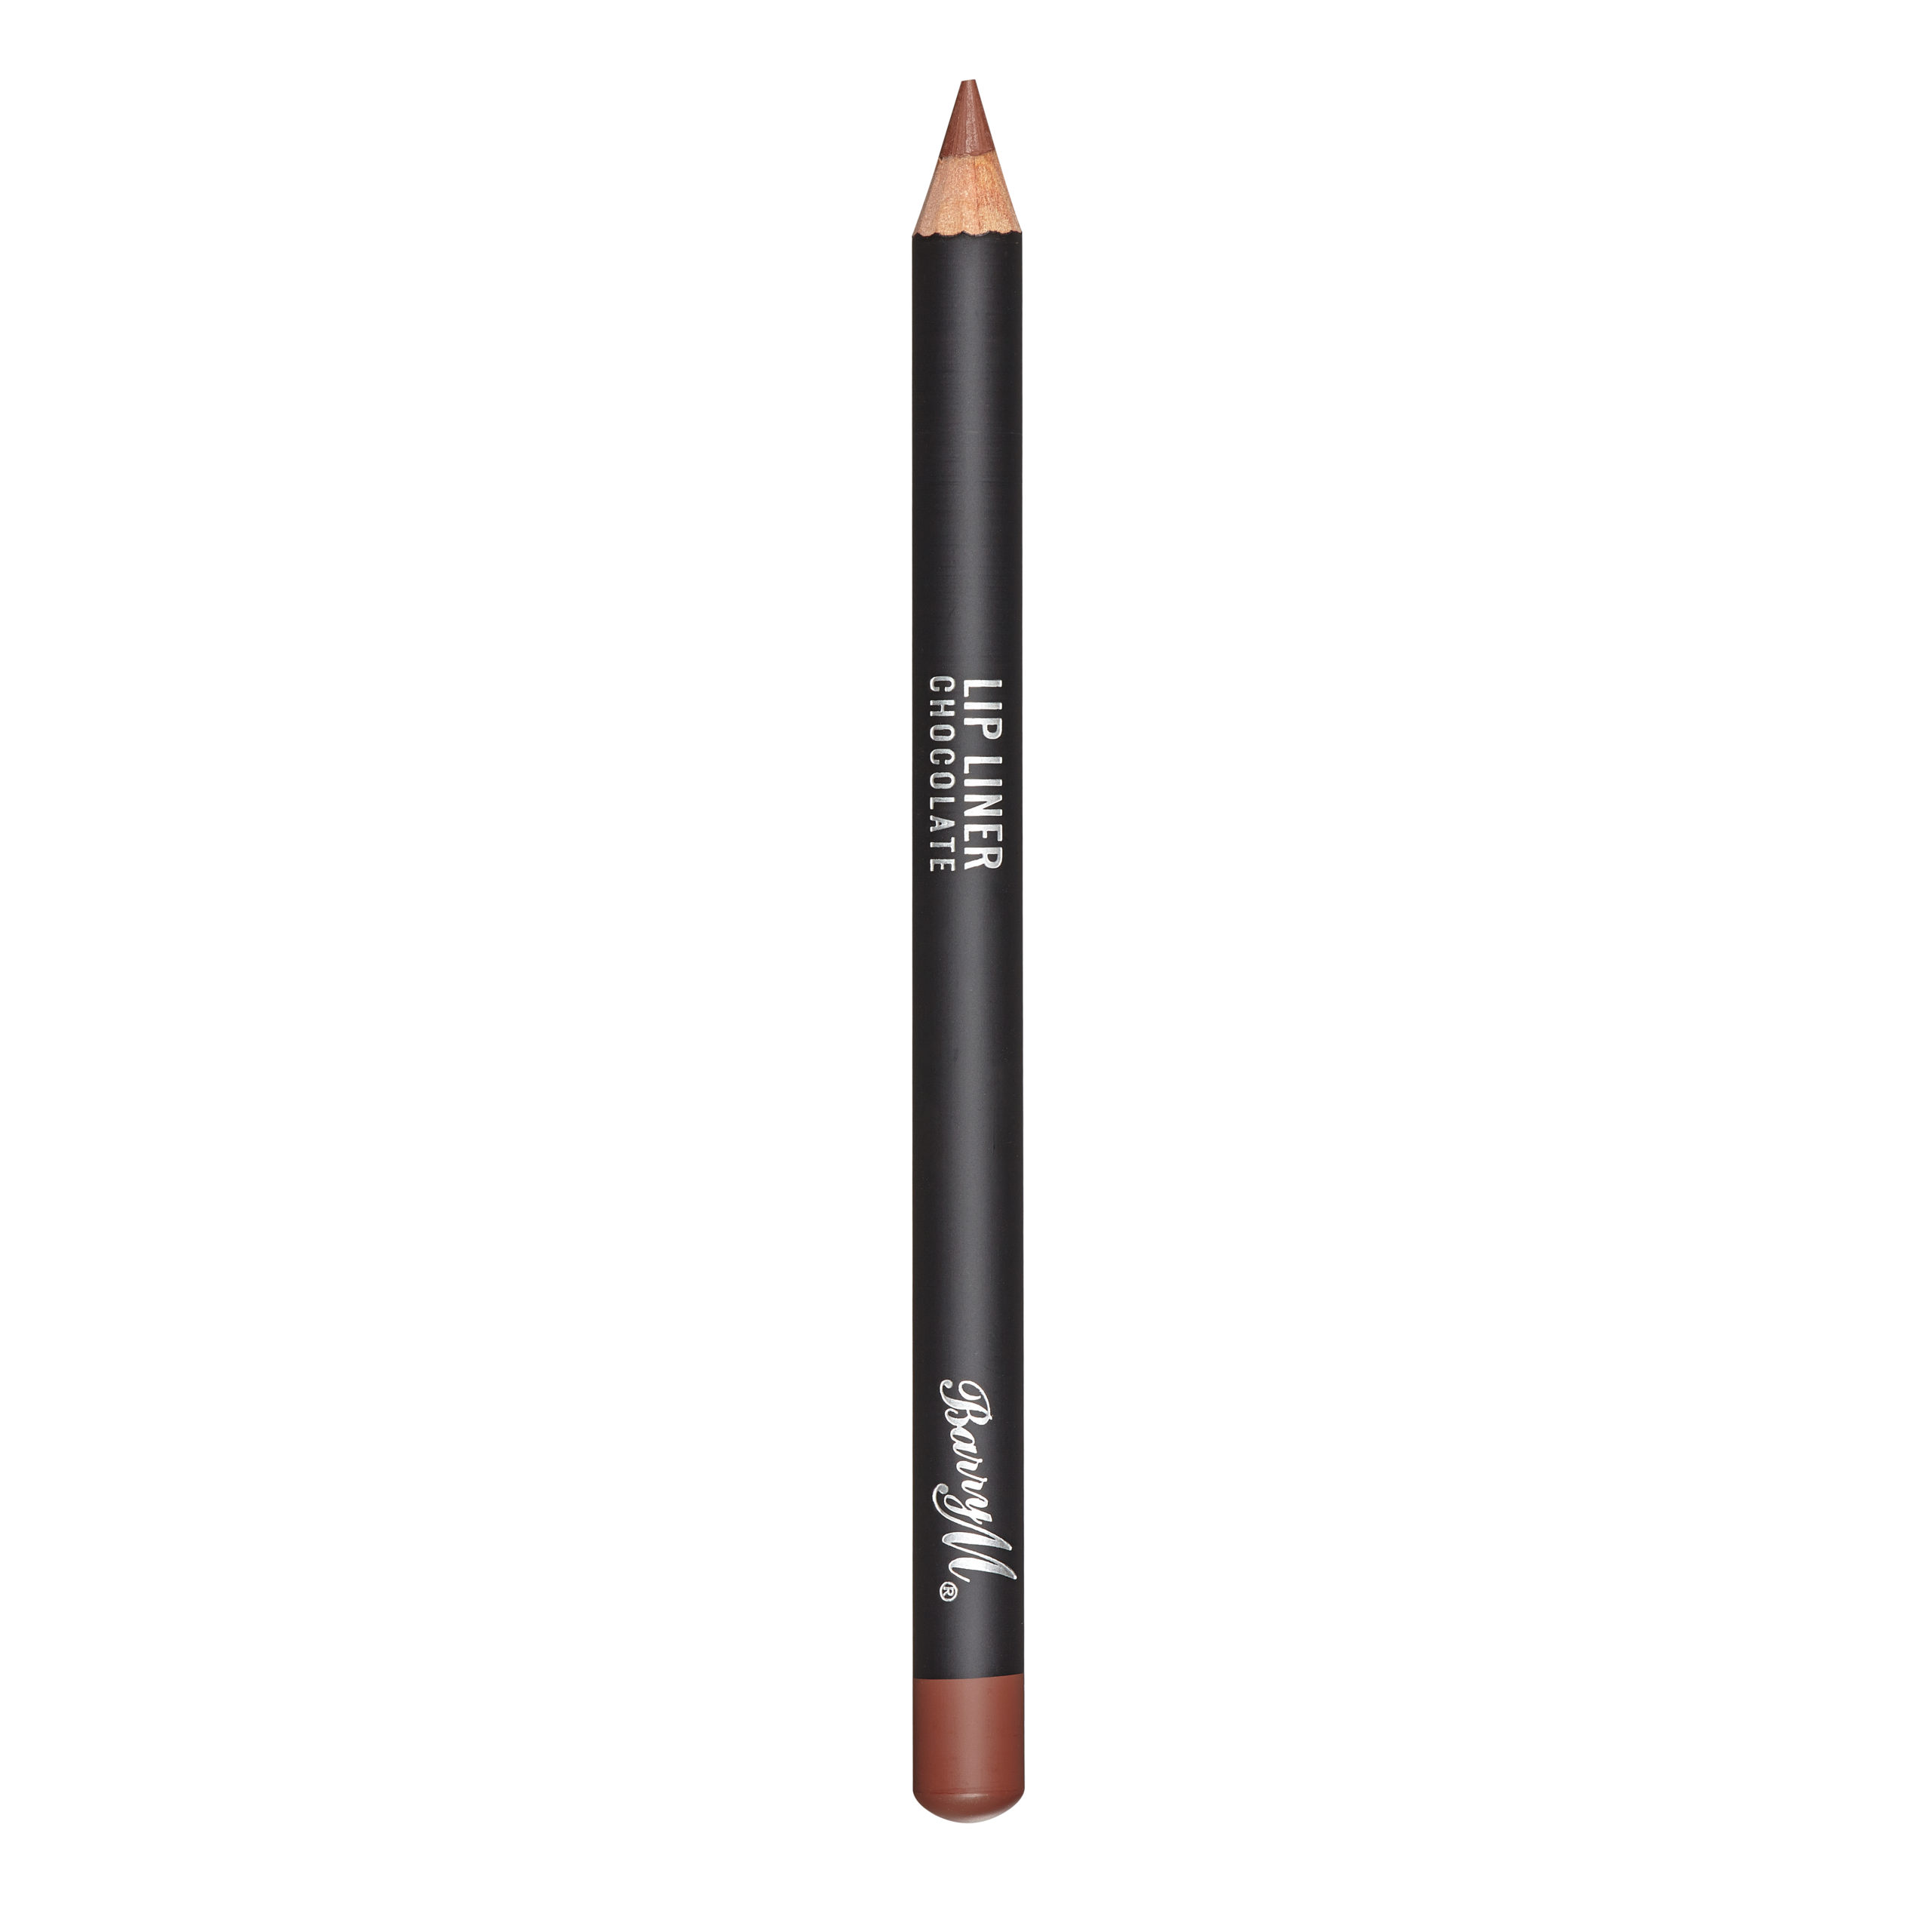 Barry M Cosmetics Lip Liner - Chocolate (no. 6)